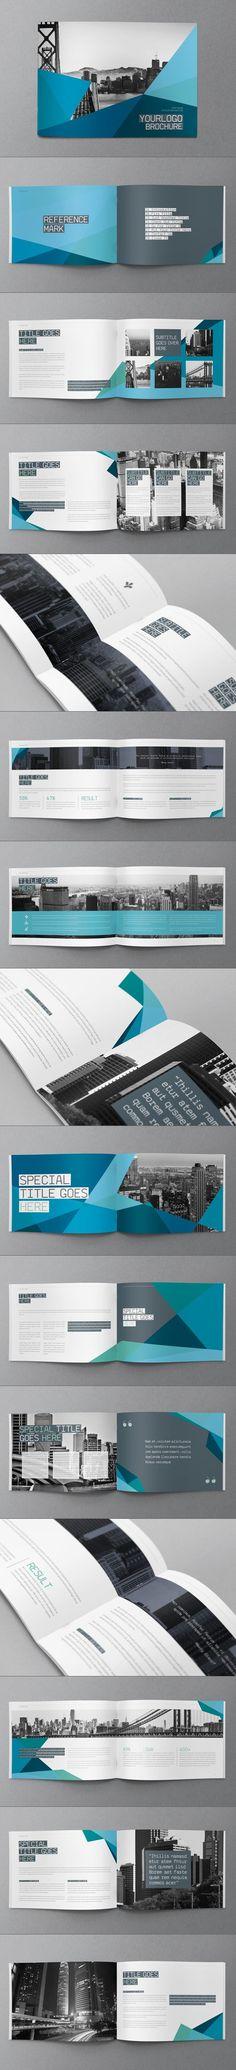 Blue Modern Brochure. Download here: http://graphicriver.net/item/blue-modern-brochure/8852088?ref=abradesign #brochure #design: